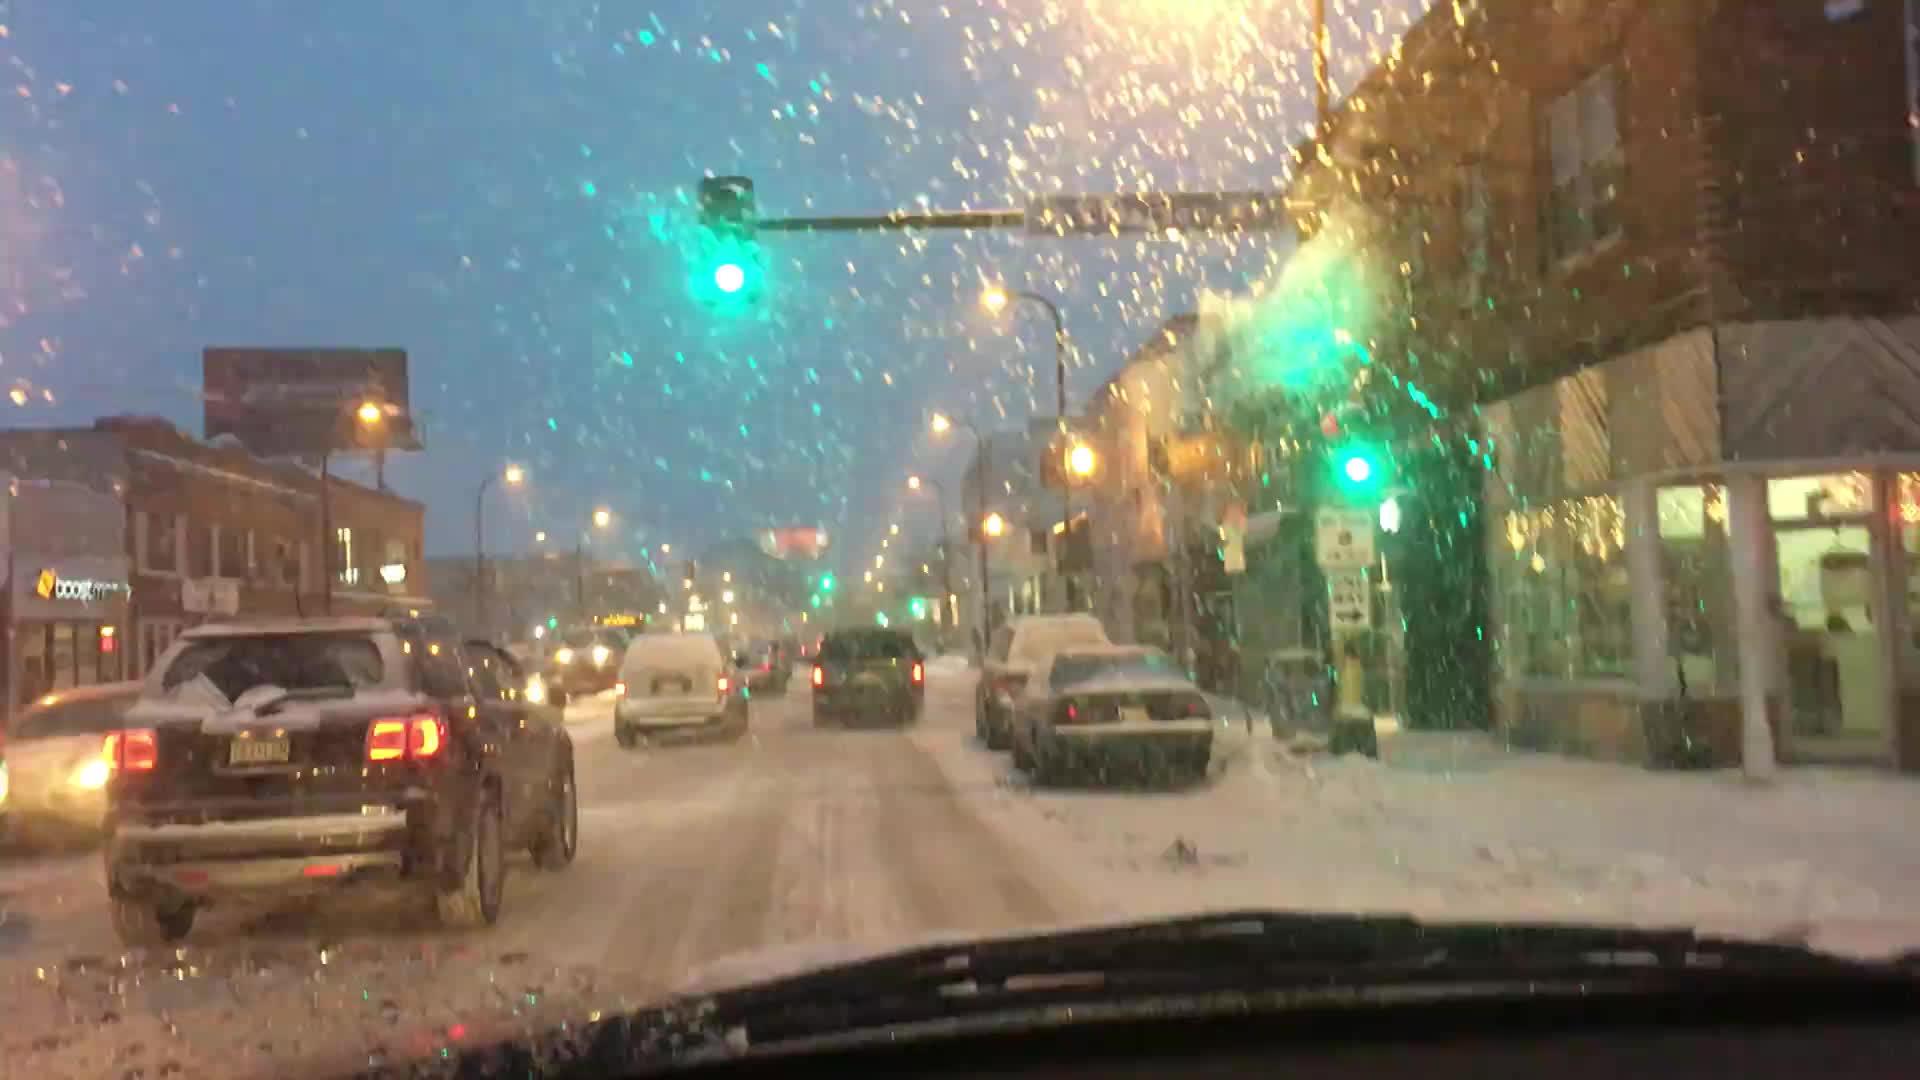 minneapolis, snow, winter, Minneapolis Winter December 16 2016 GIFs